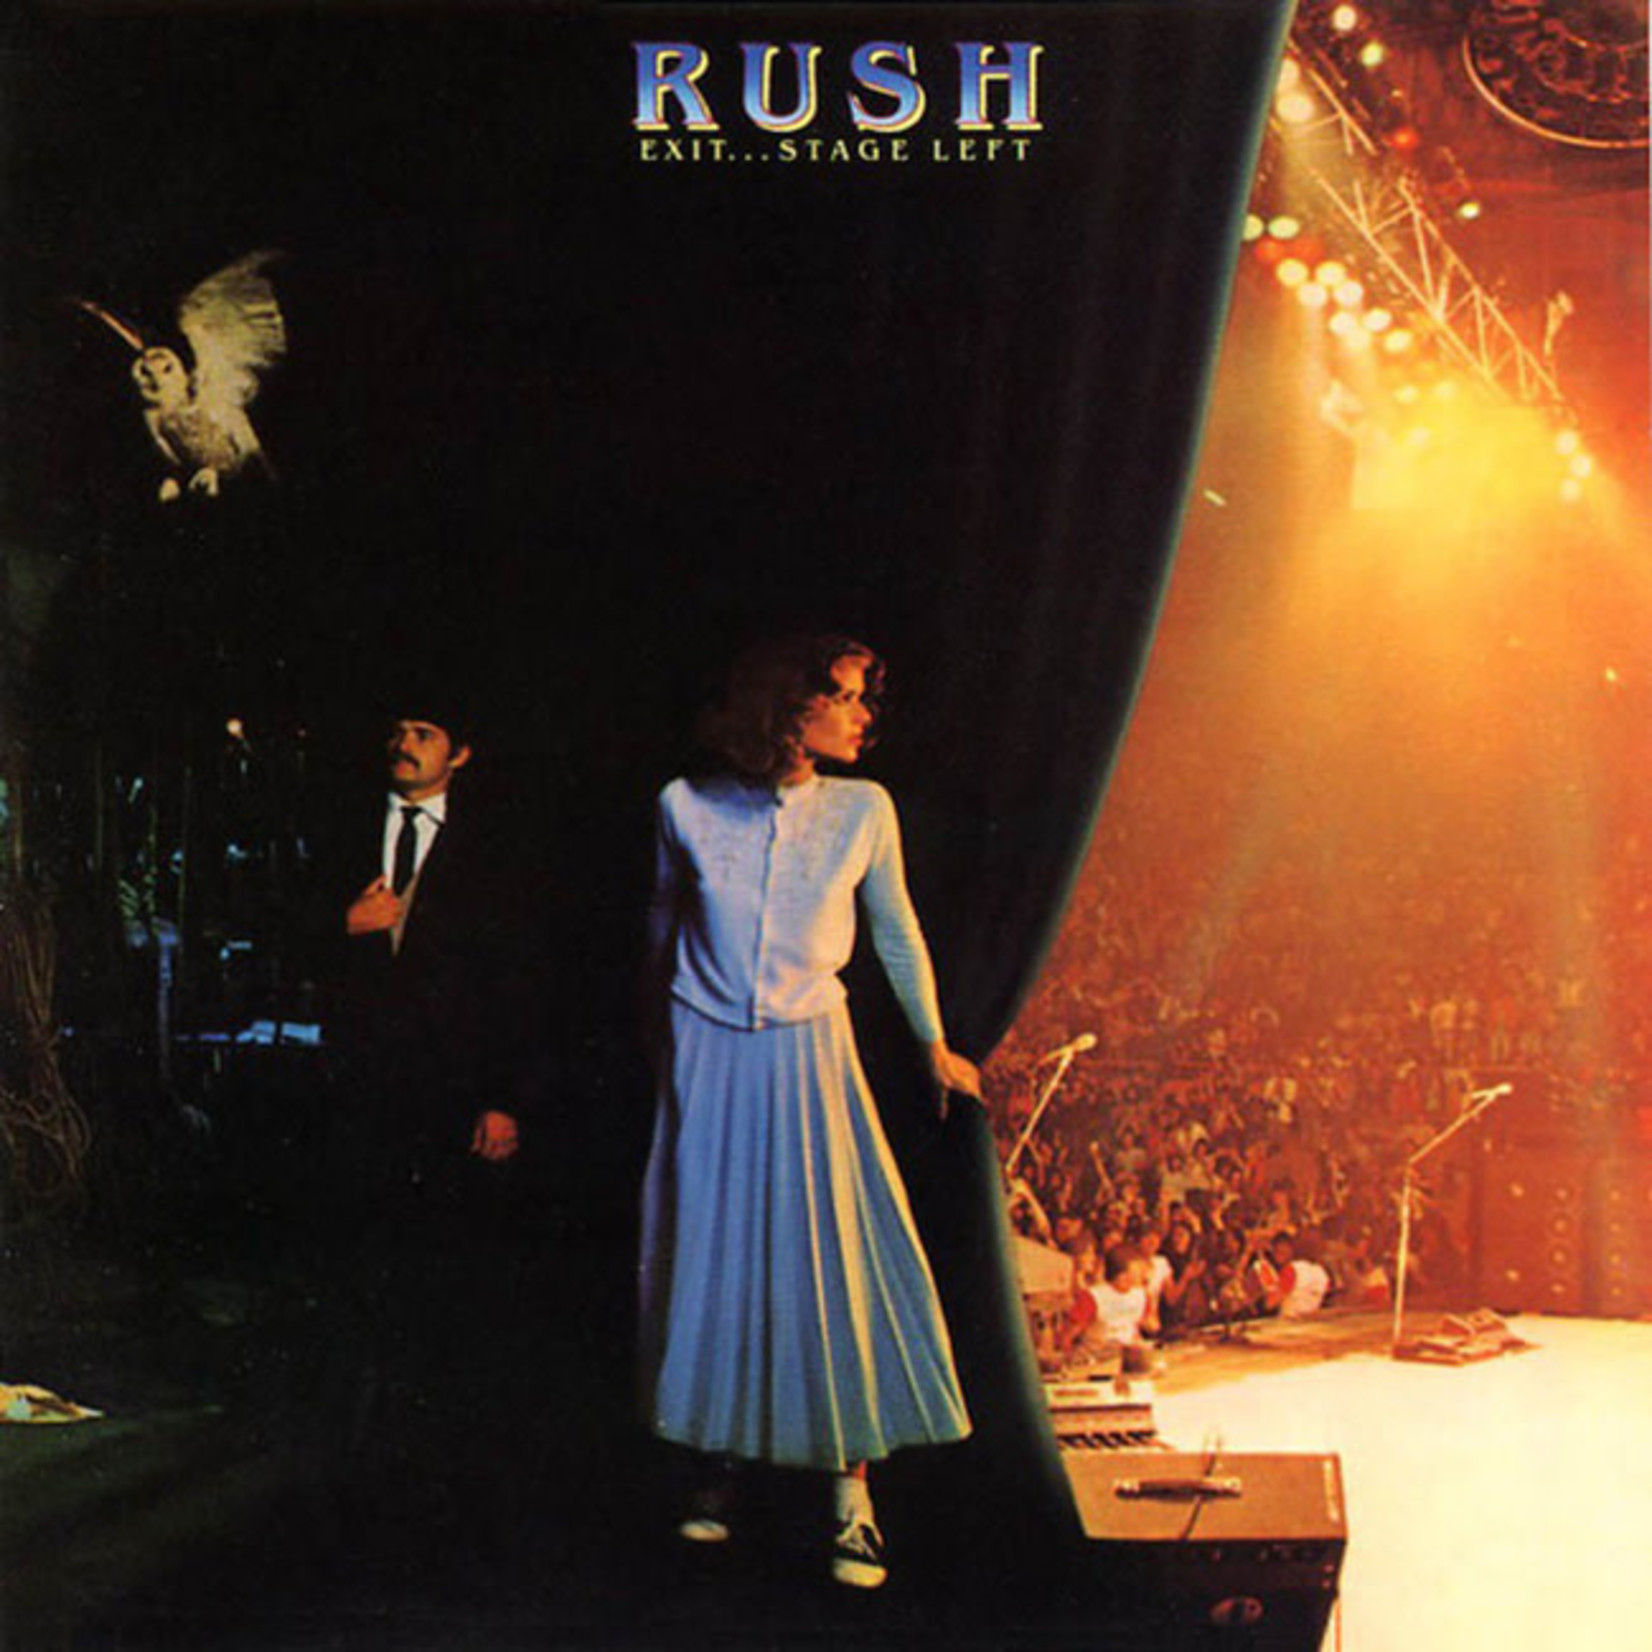 [New] Rush: Exit... Stage Left (2LP)